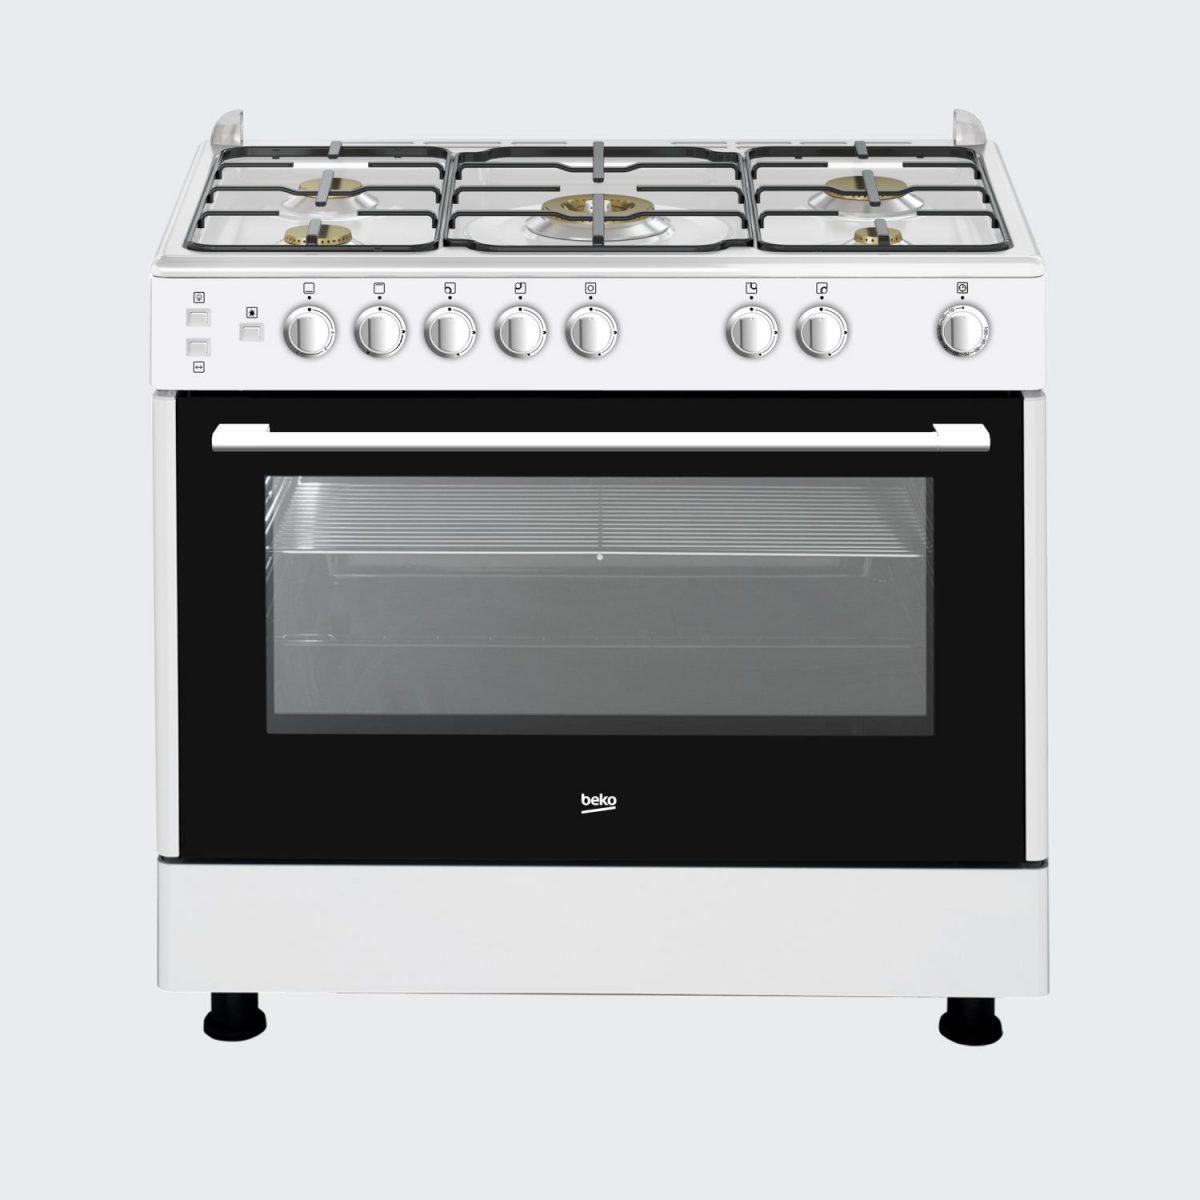 BEKO 5 Burner Gas Cooker (GG 15117 CWYV) – 90×60